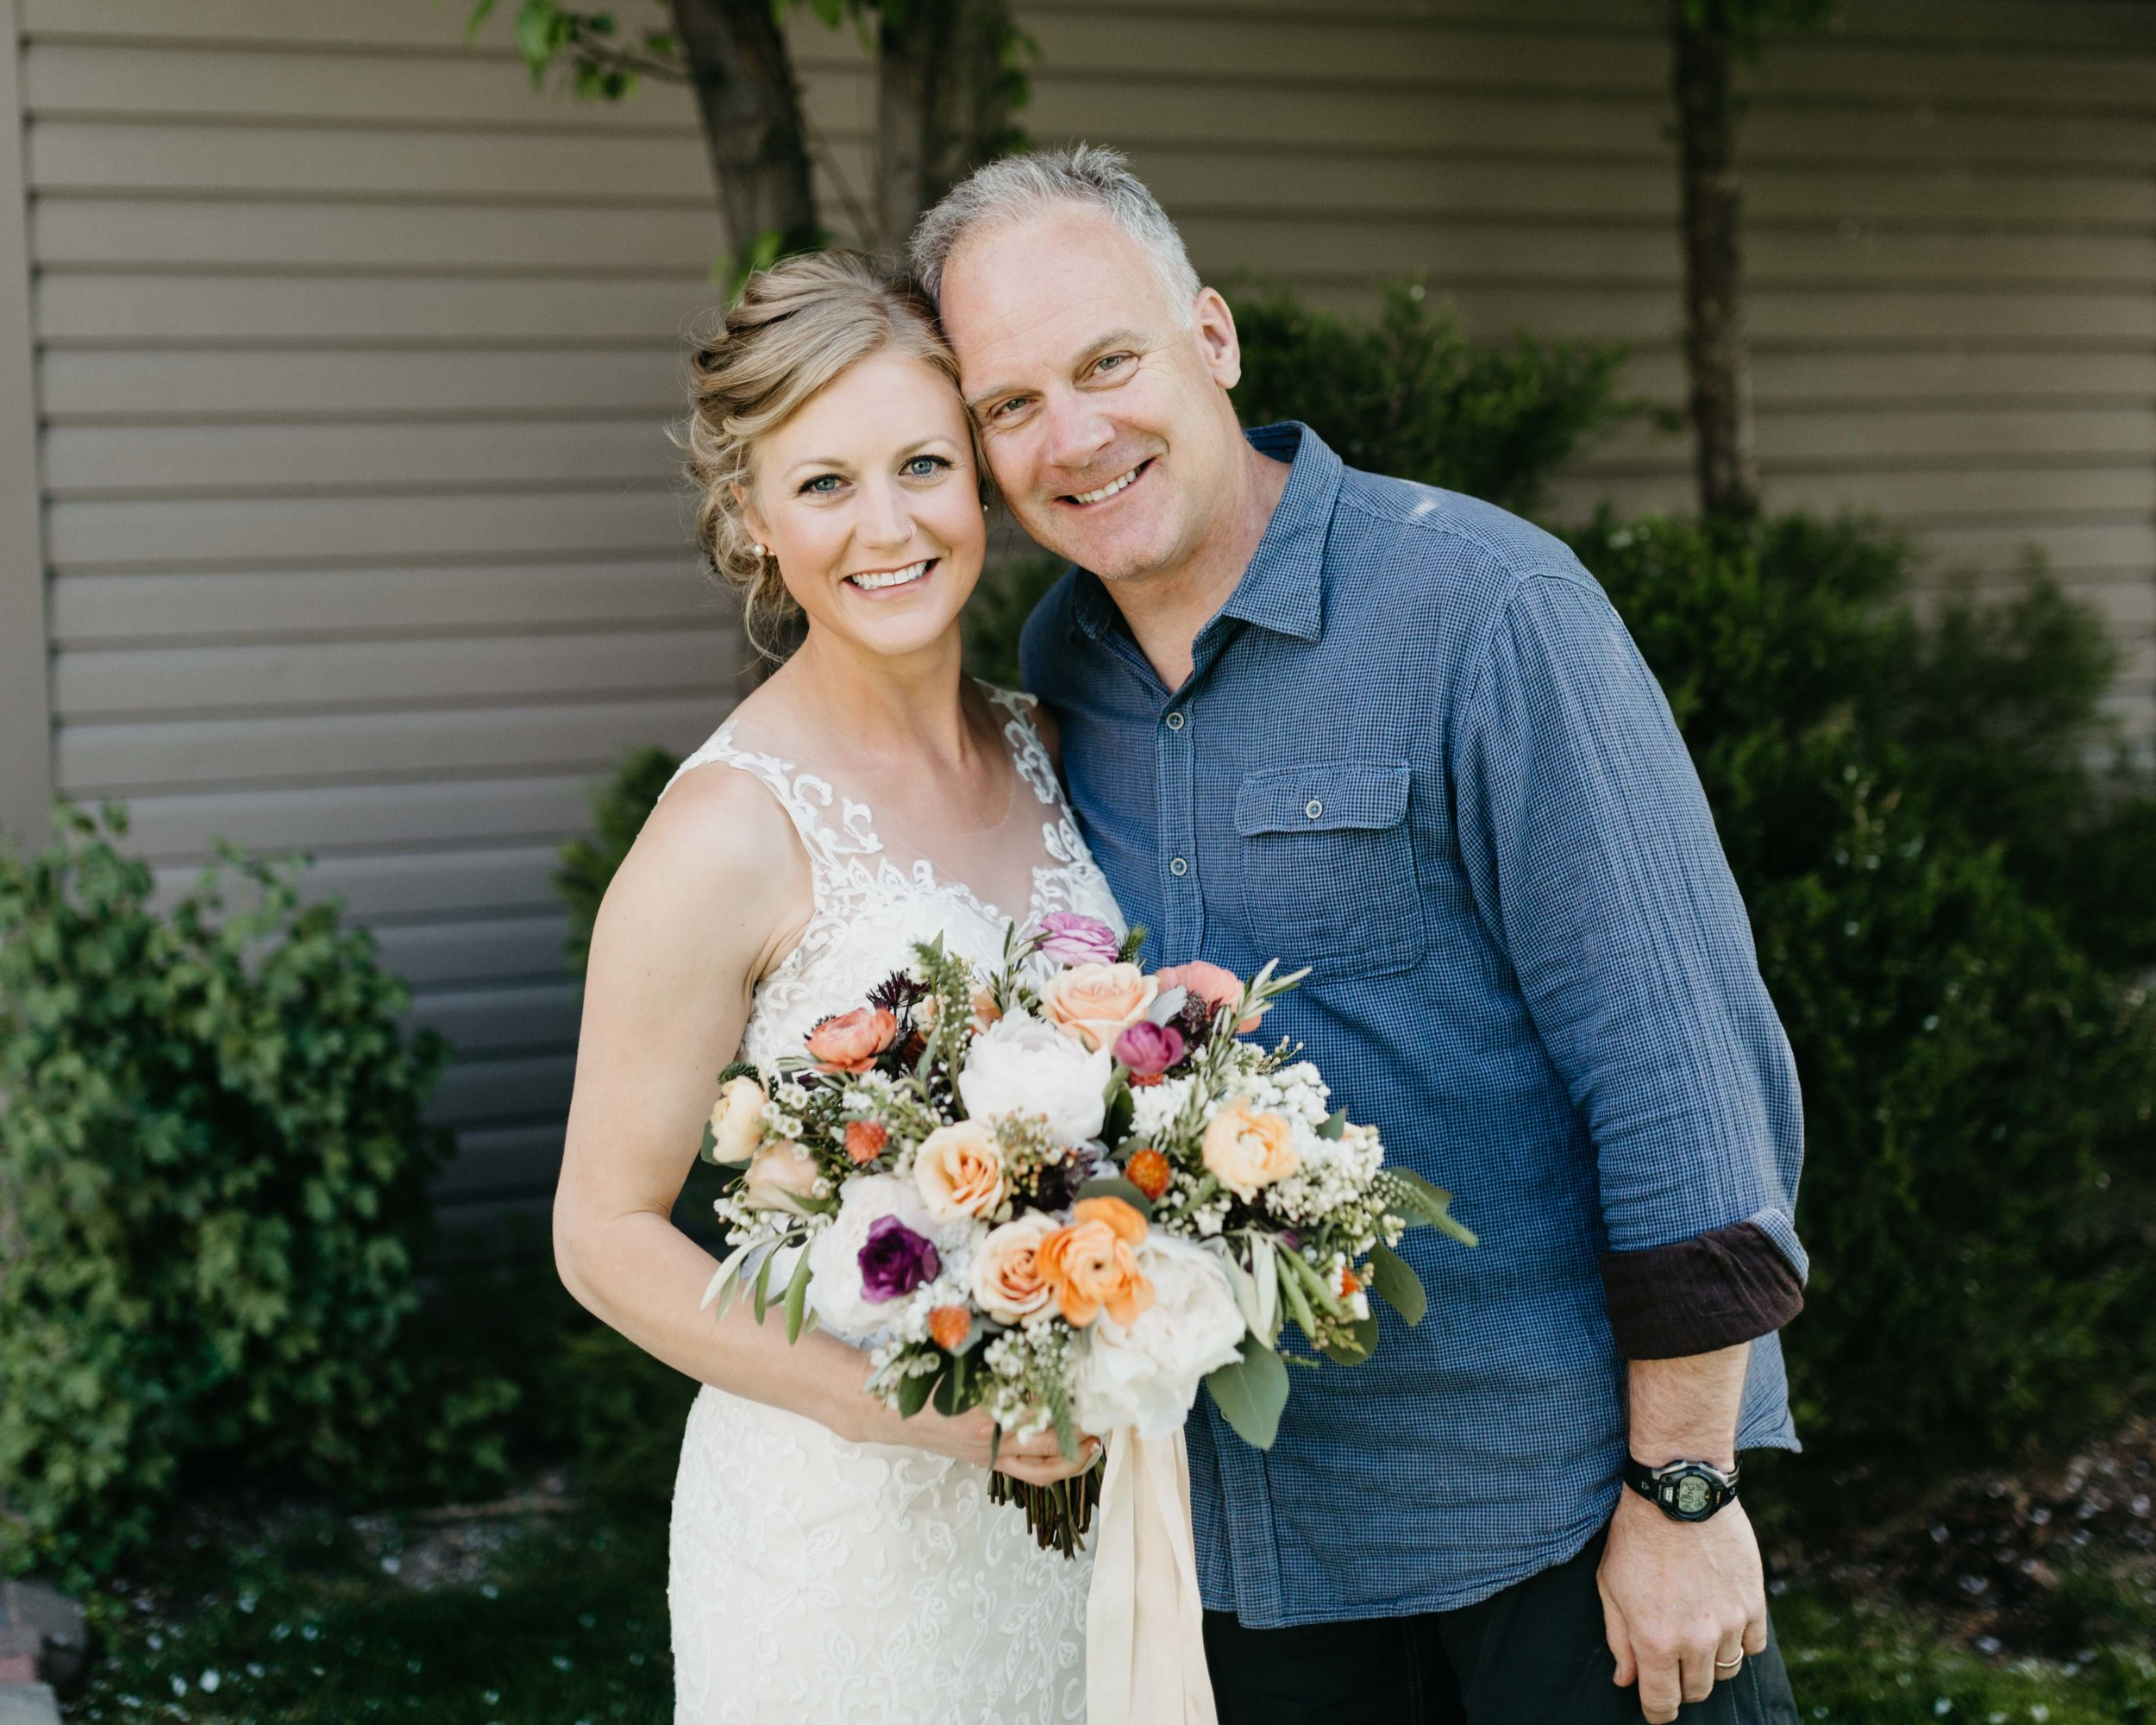 Colorado-Wedding-Photographer-15.jpg